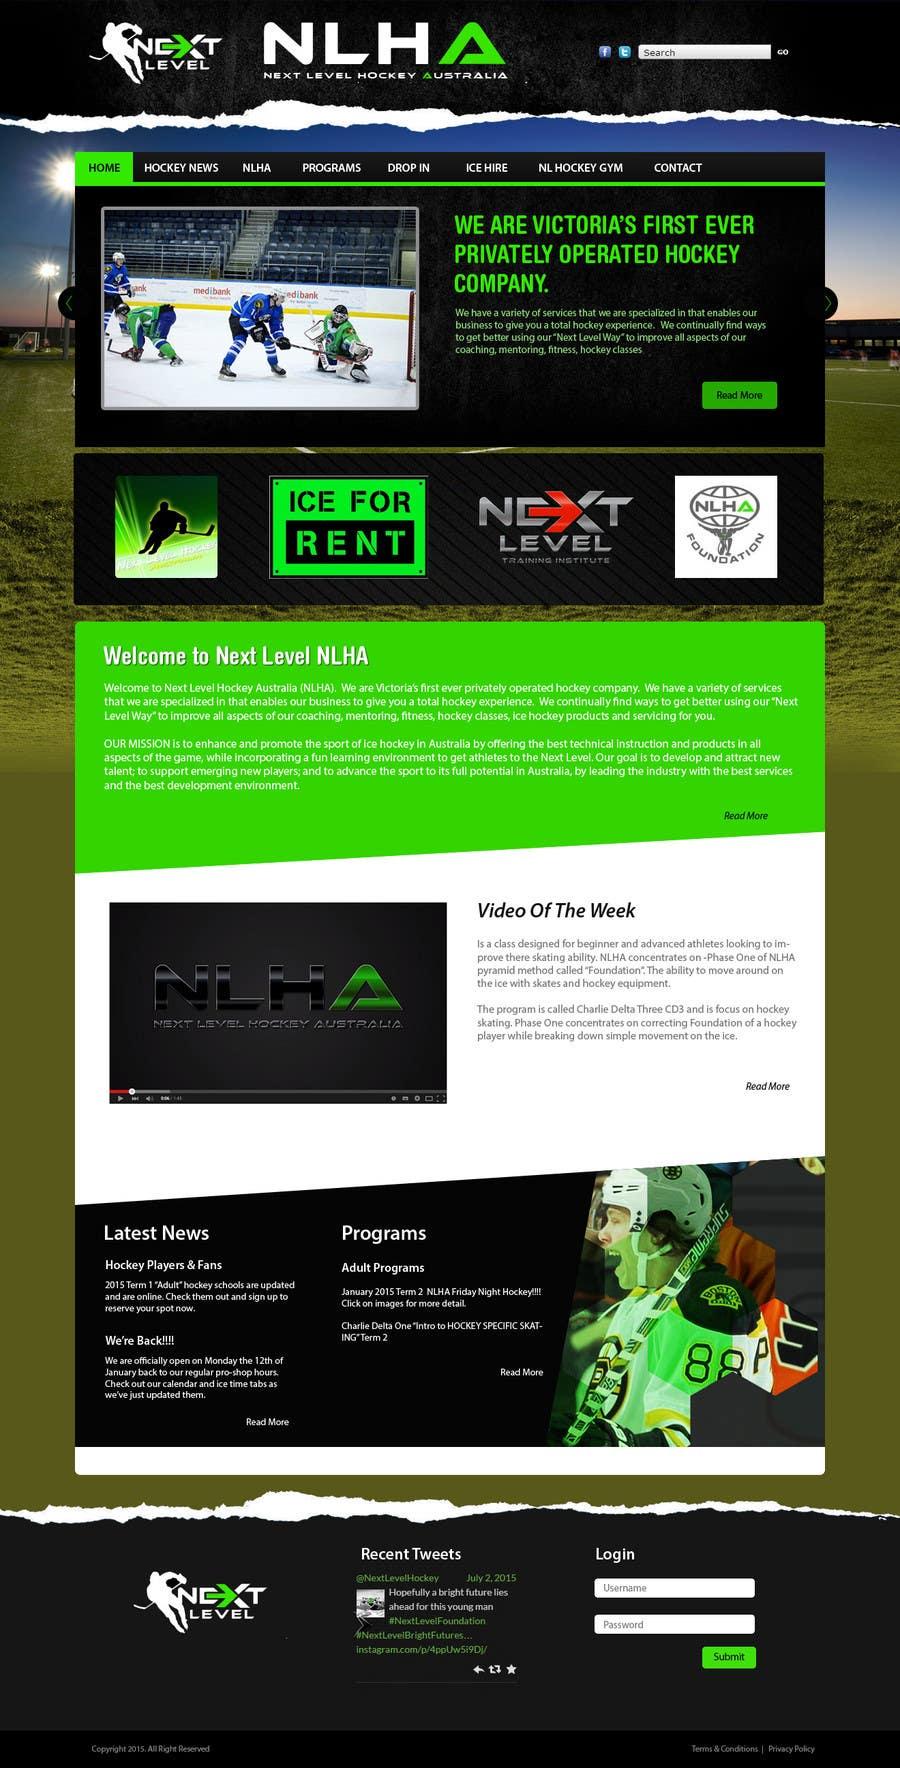 Bài tham dự cuộc thi #16 cho Design a Website Mockup for NextLevelHockey